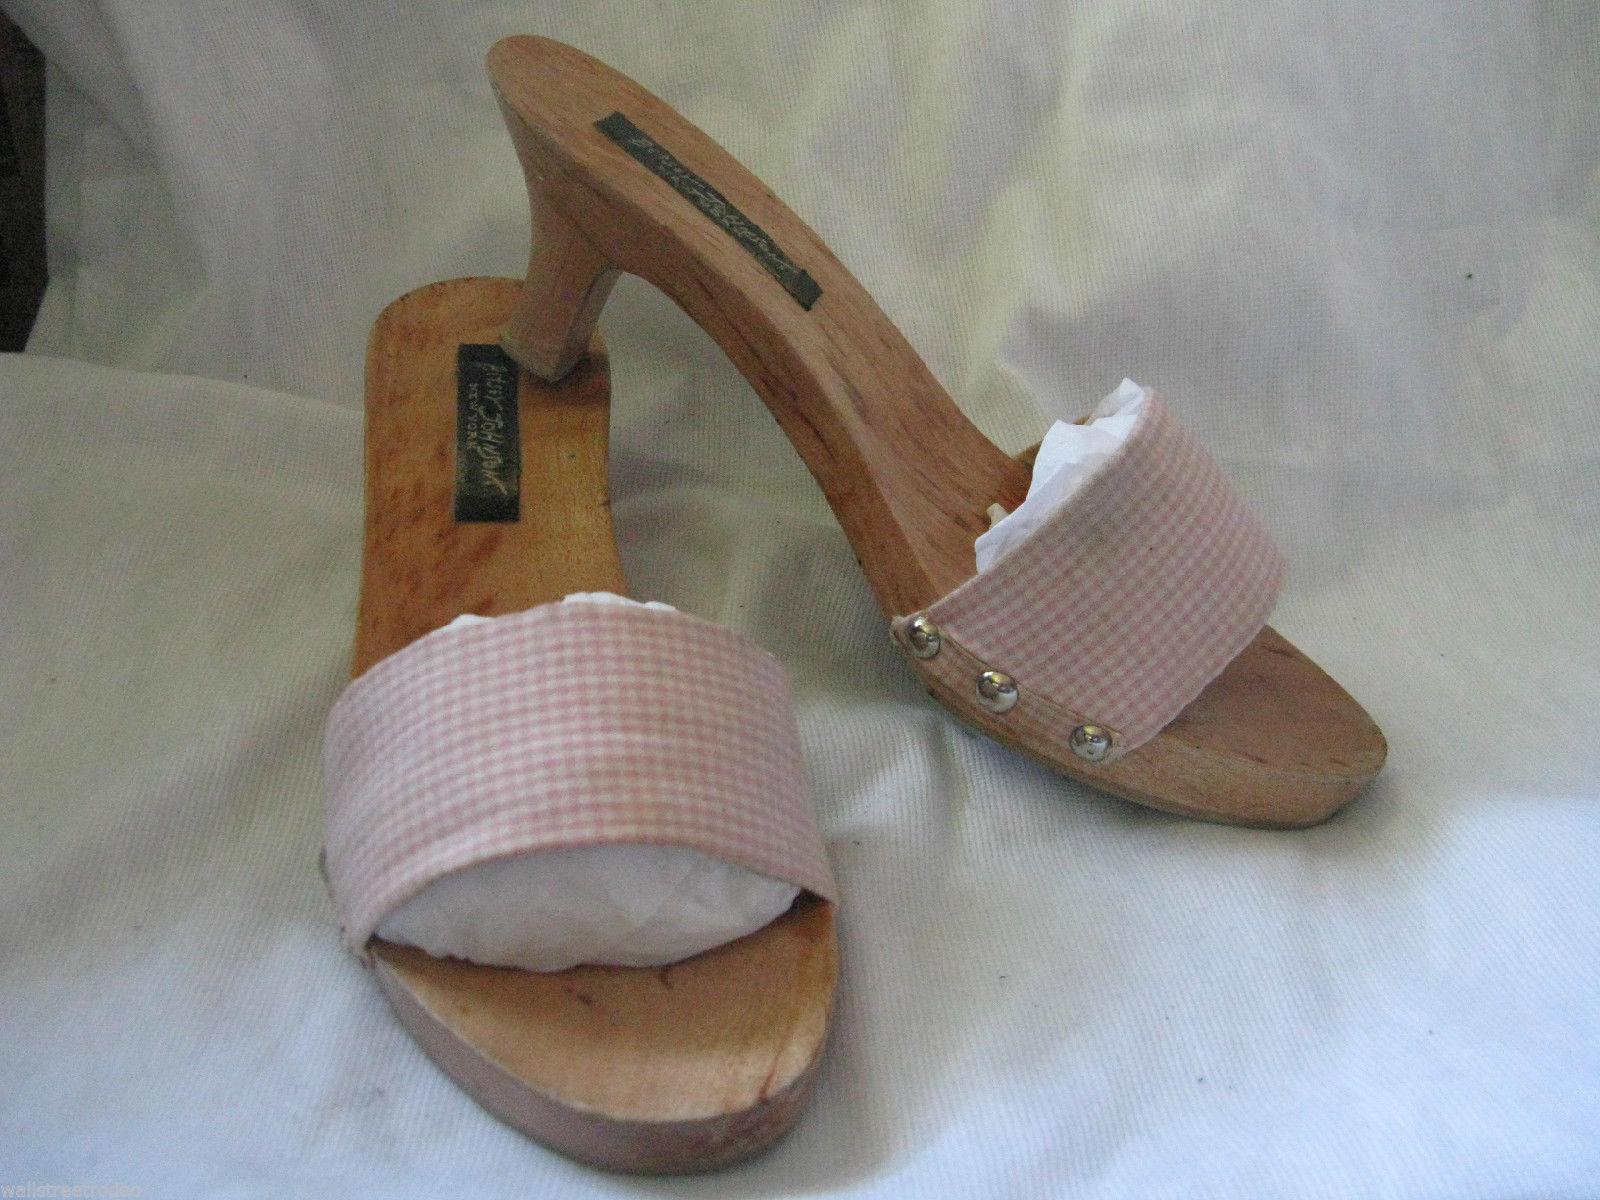 Betsey Johnson gingham wooden mules platform wedge sandals shoes VLV 6UK3.5 36 - $18.49